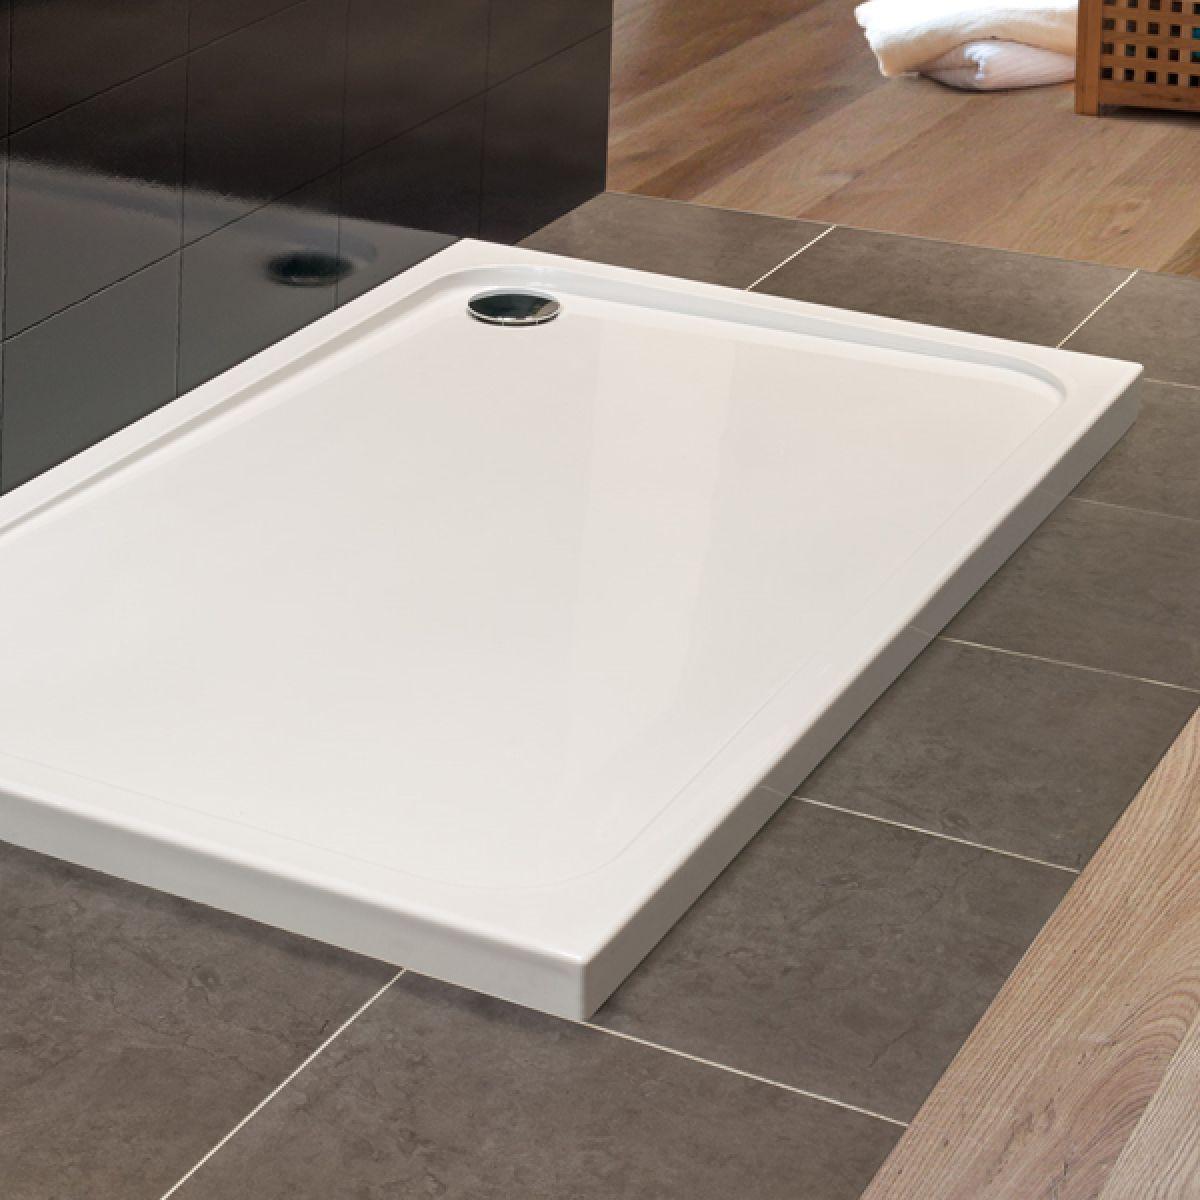 merlyn-mstone-rectangular-shower-tray-1500-x-700mm